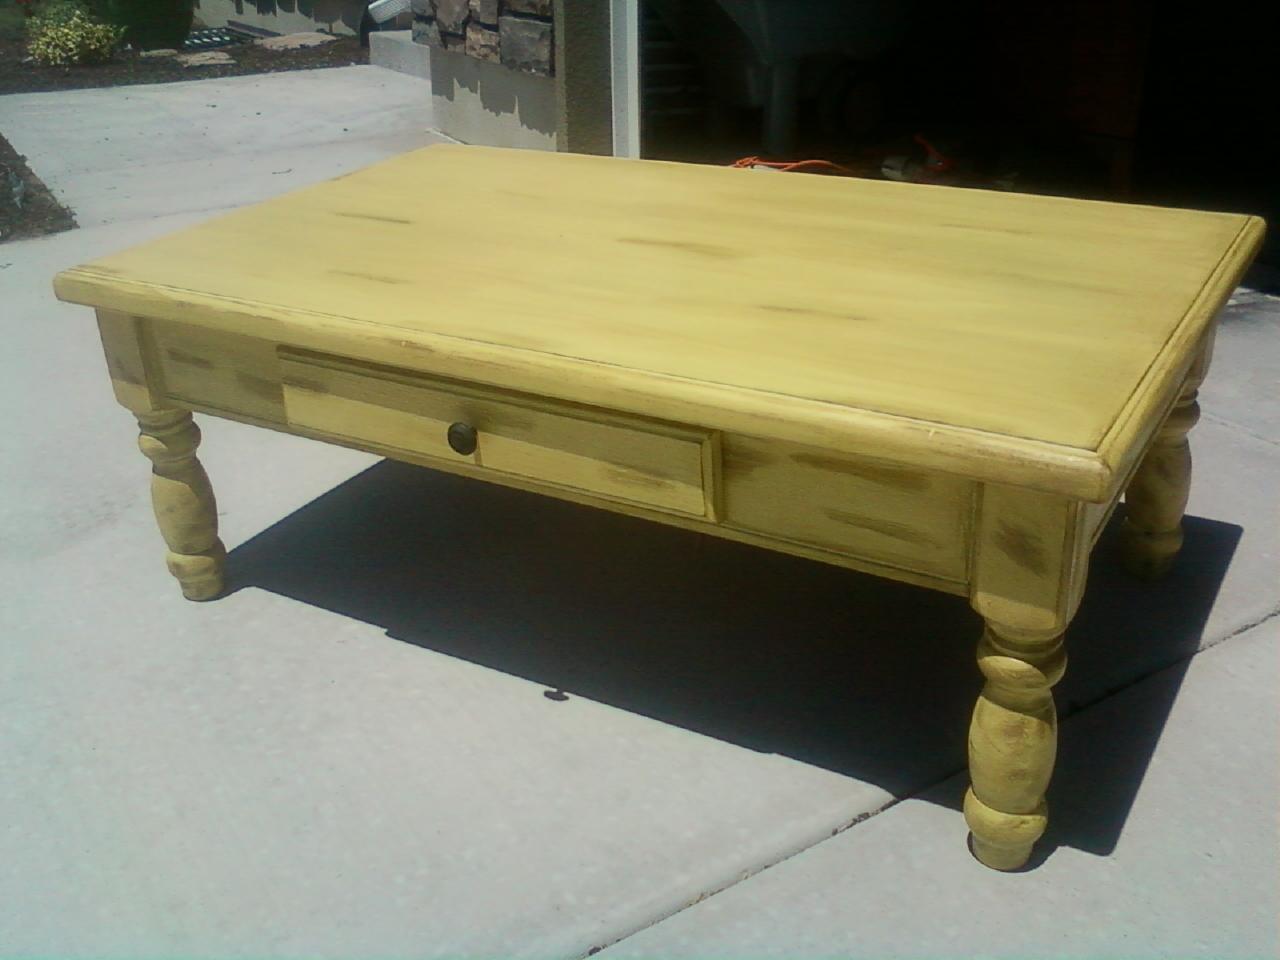 Mustard yellow coffee table